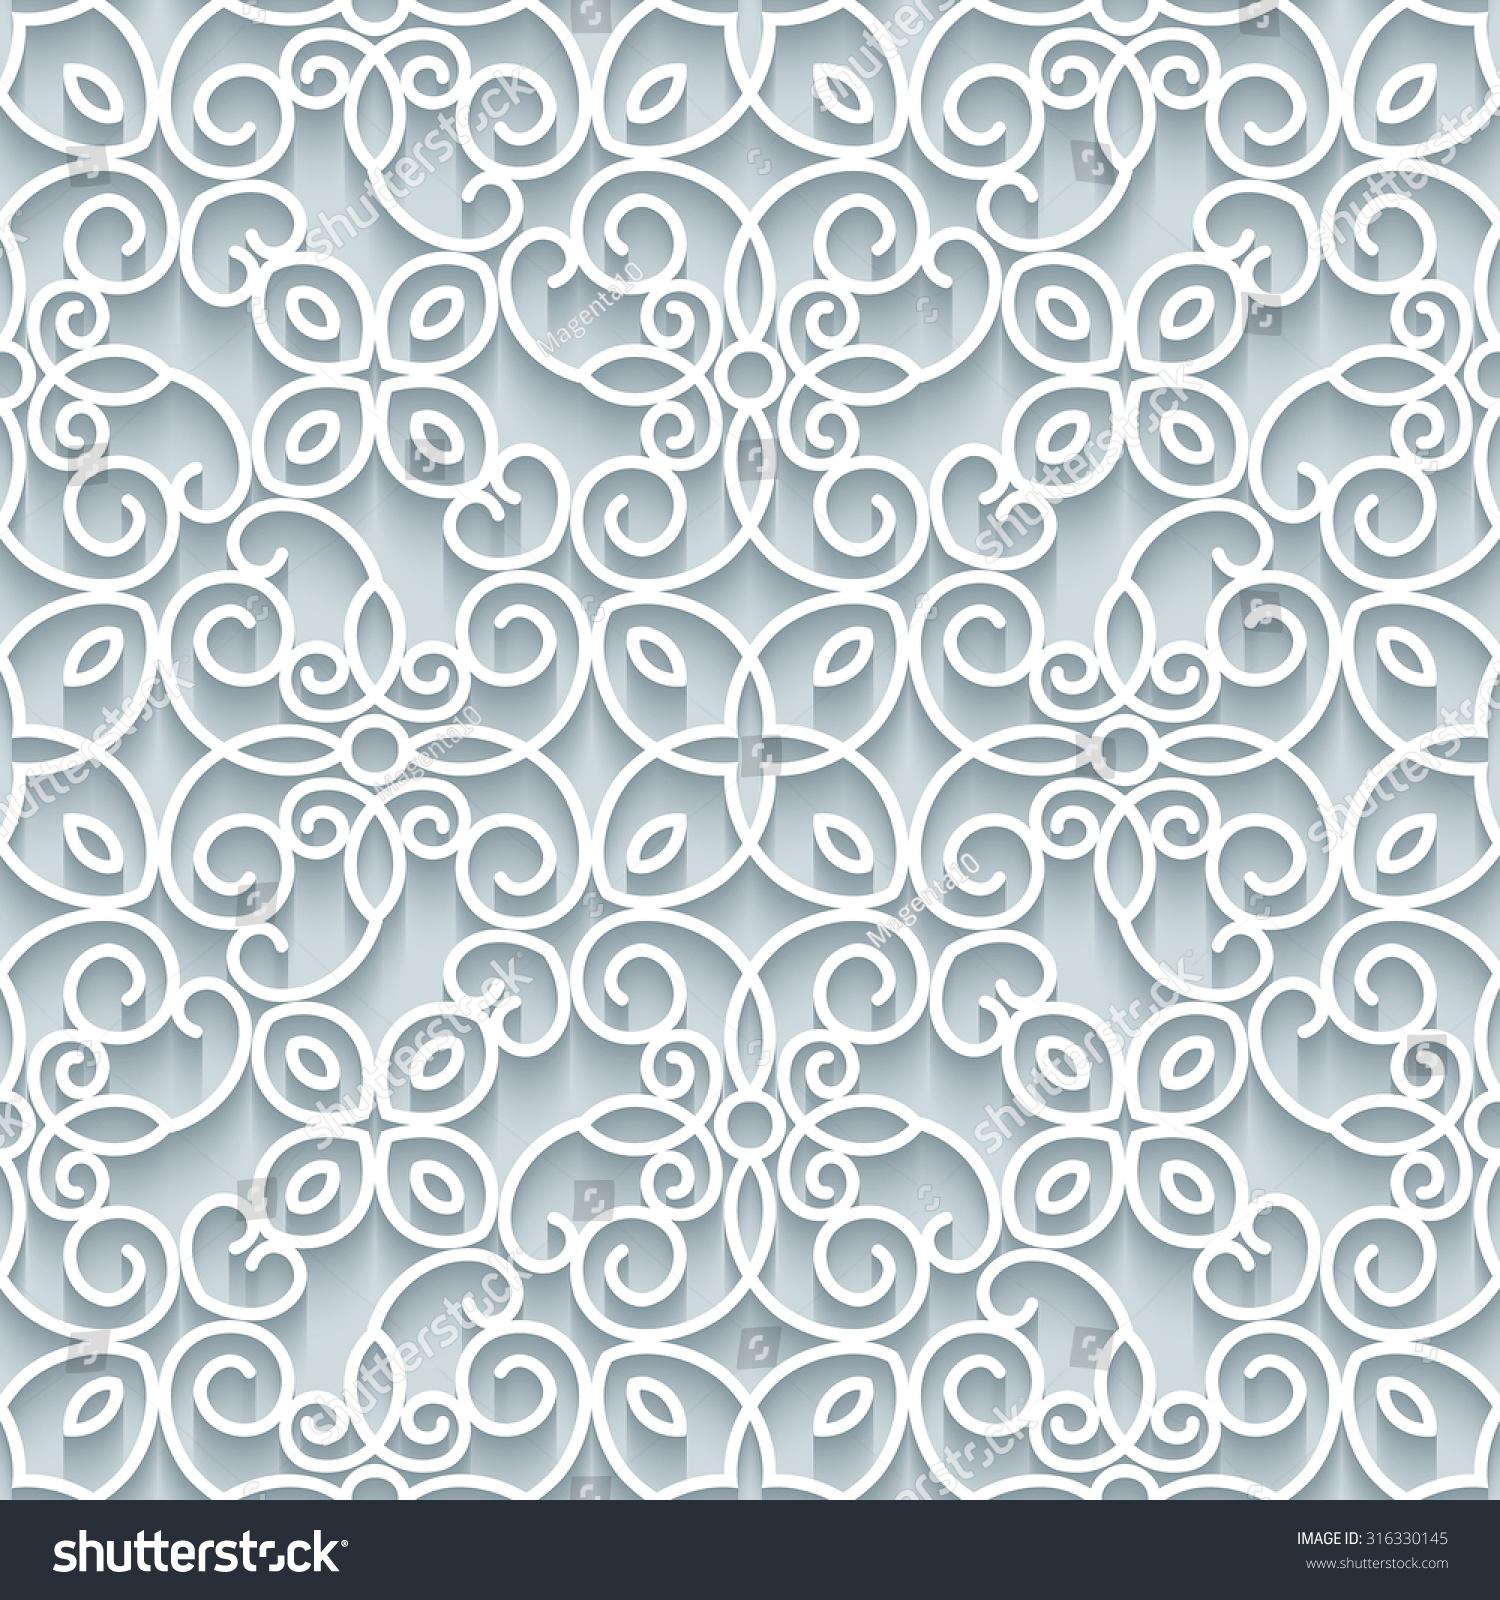 texture paper ornament - photo #5